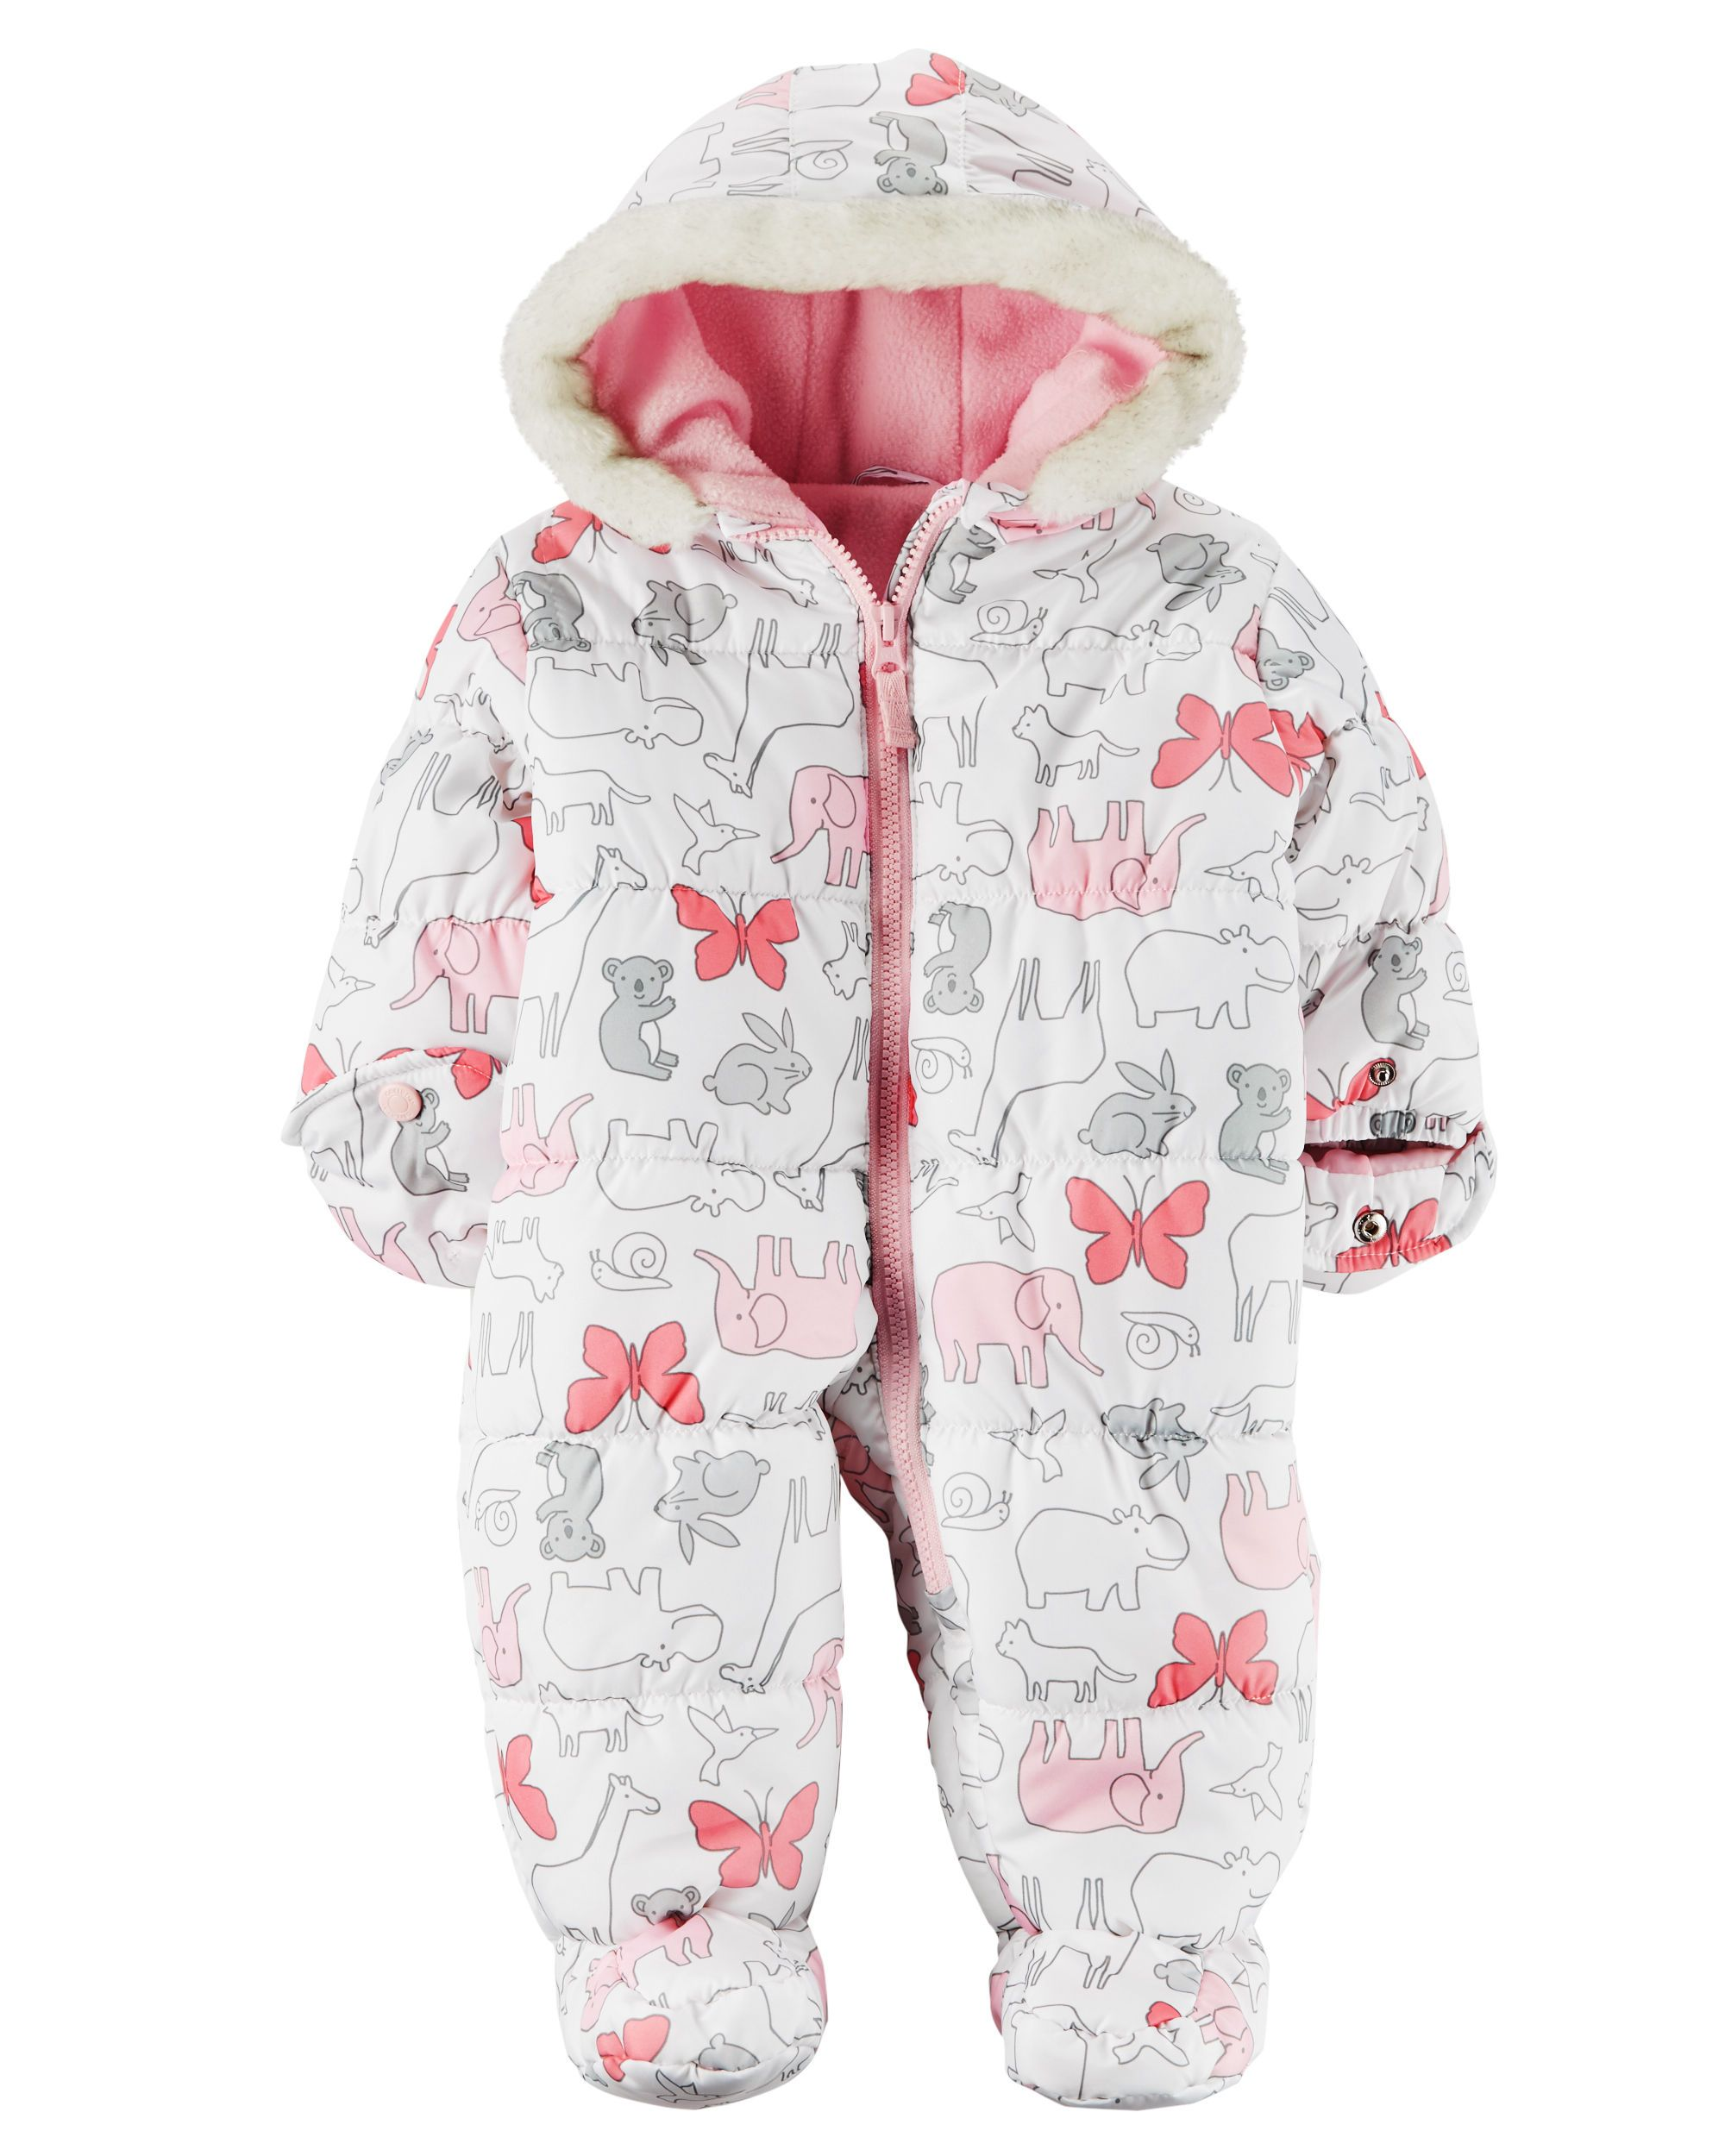 New Carter/'s Winter Pram Snowsuit Light Pink size 6m NWT Bear Ears on Hood